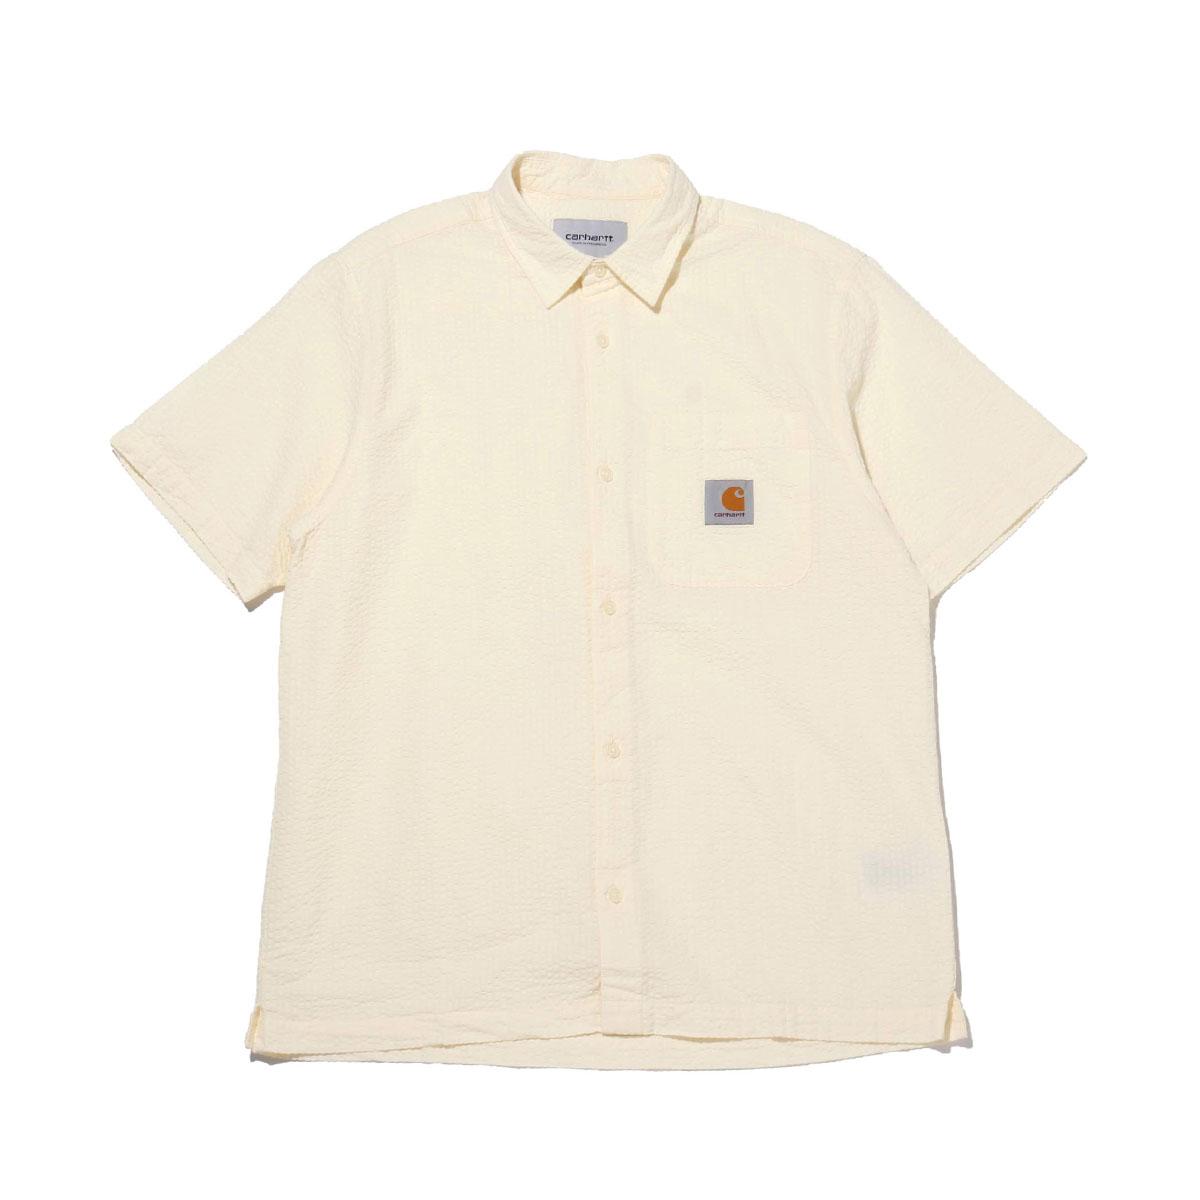 CARHARTT S/S SOUTHFIELD SHIRT(カーハート S/S サウスフィールド シャツ)WAX【メンズ 半袖シャツ】20SS-I